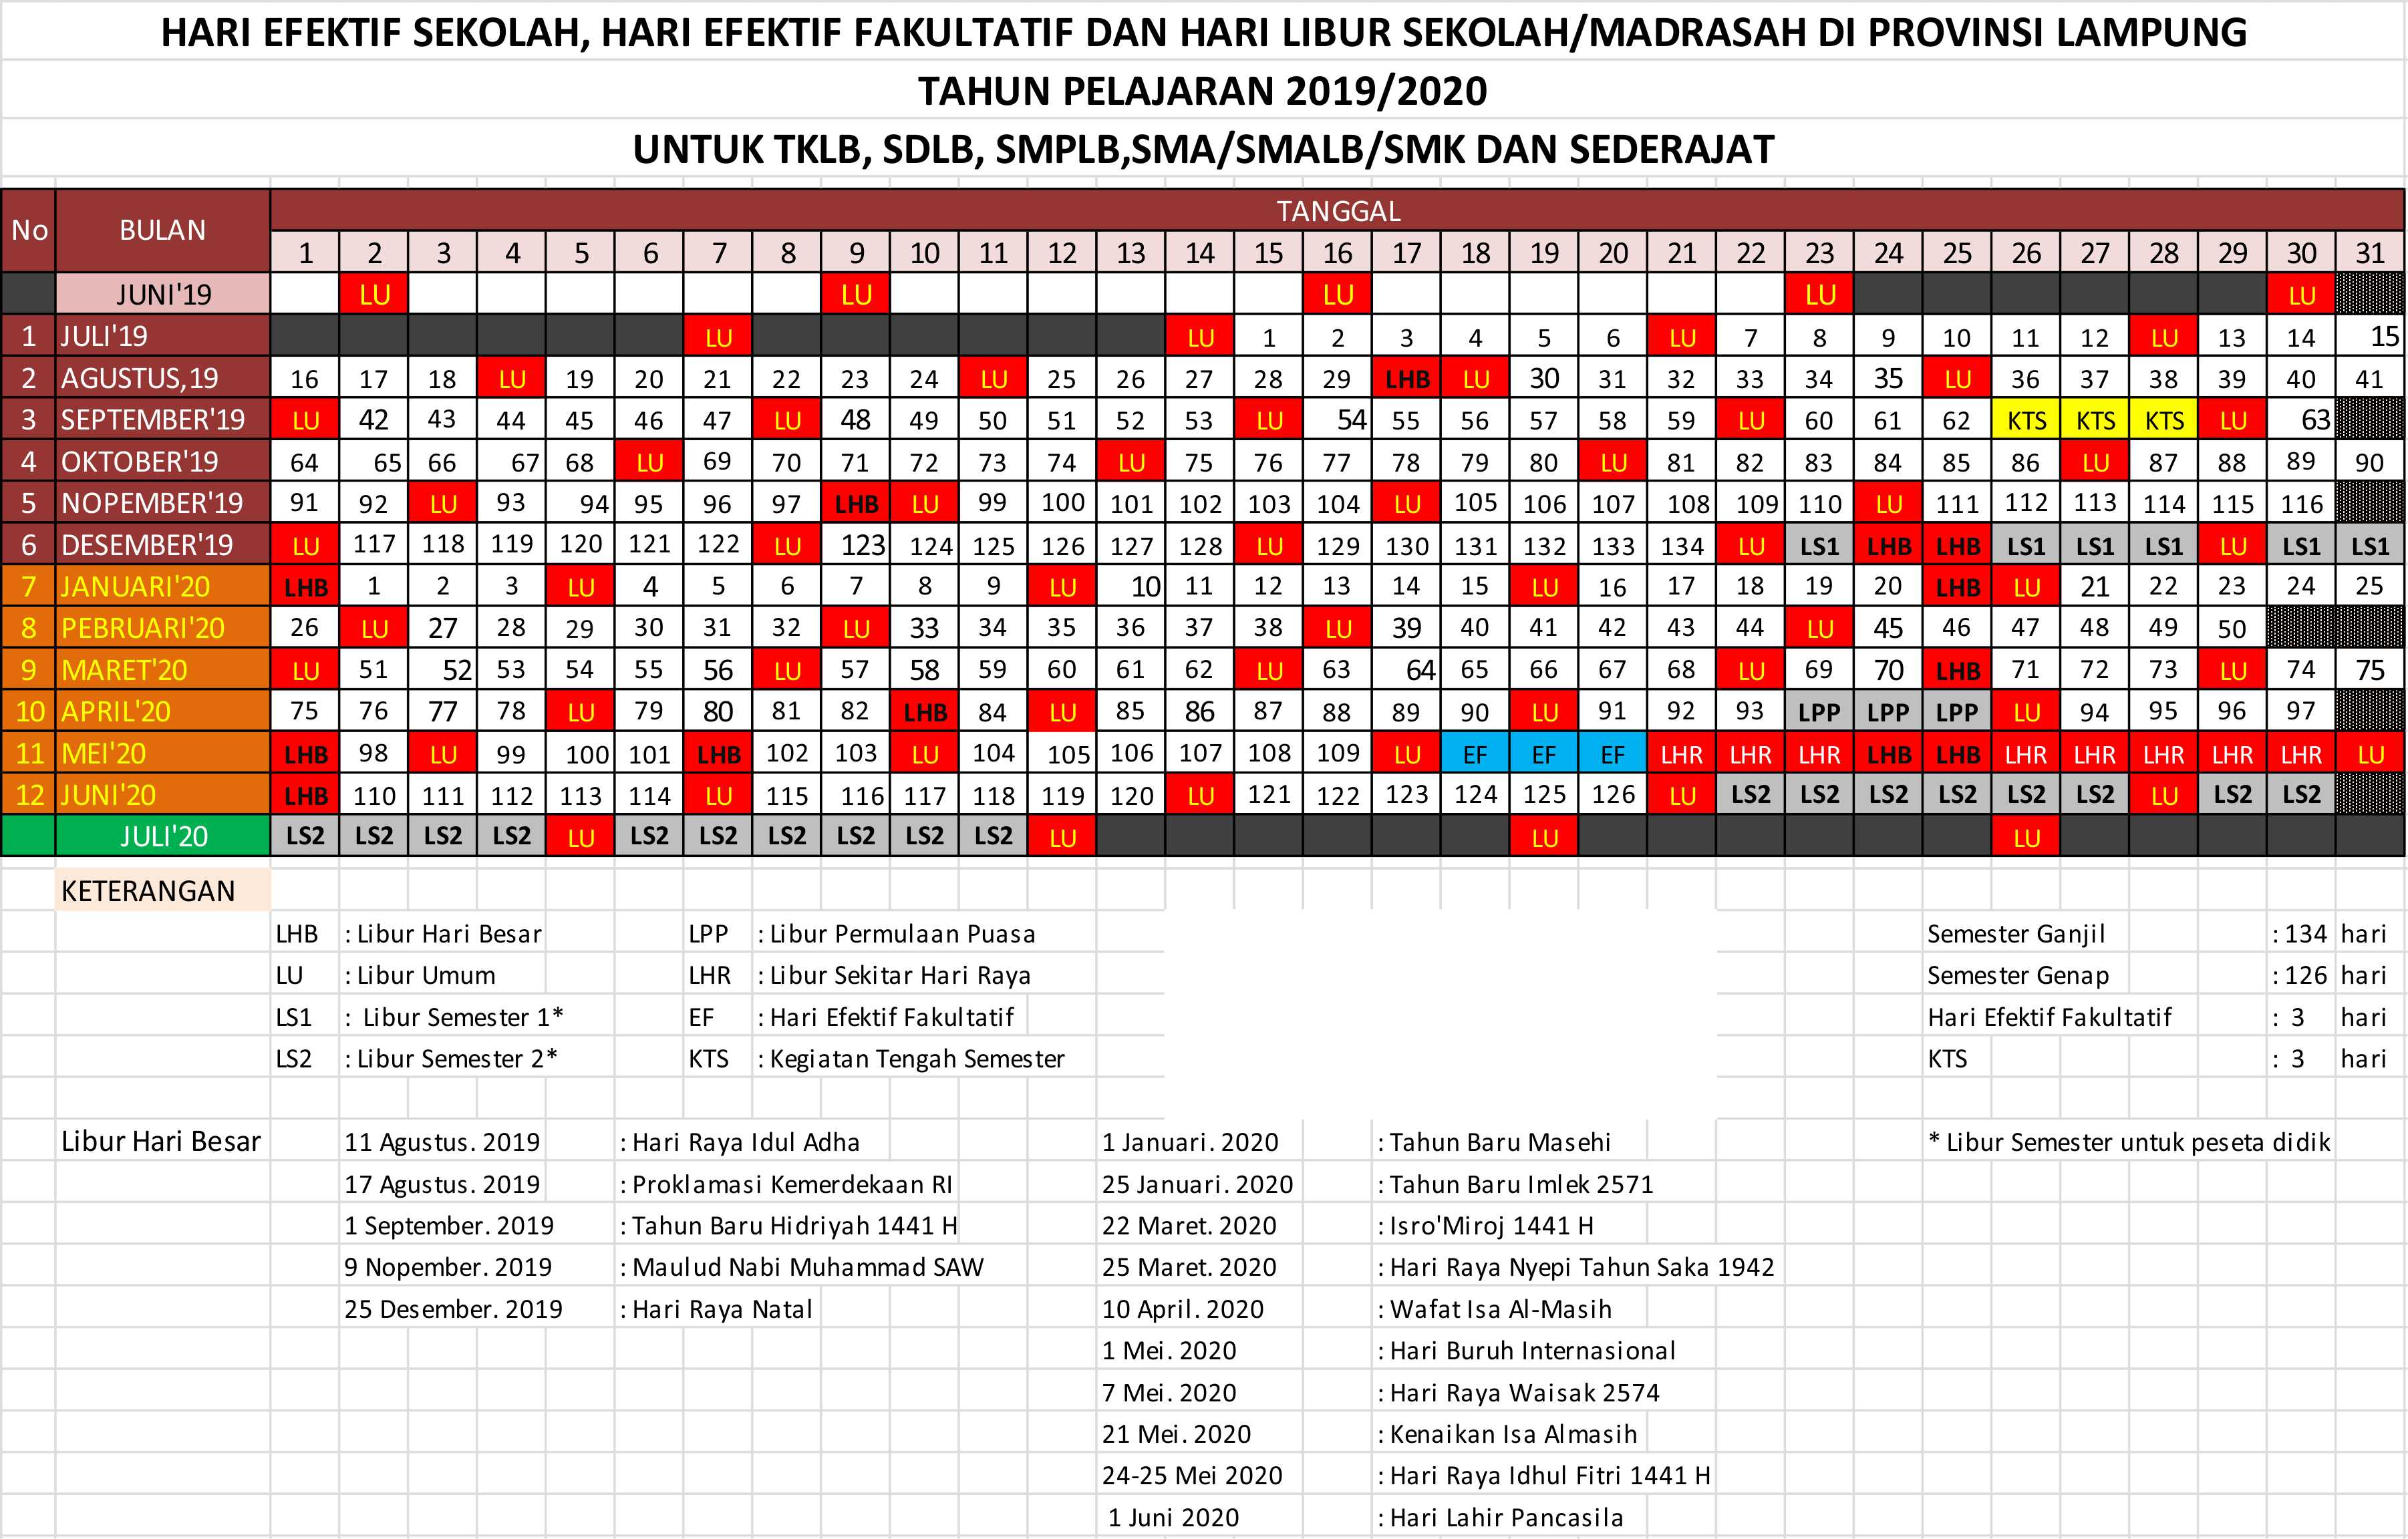 kalender pendidikan 2019 - 2020 lampung